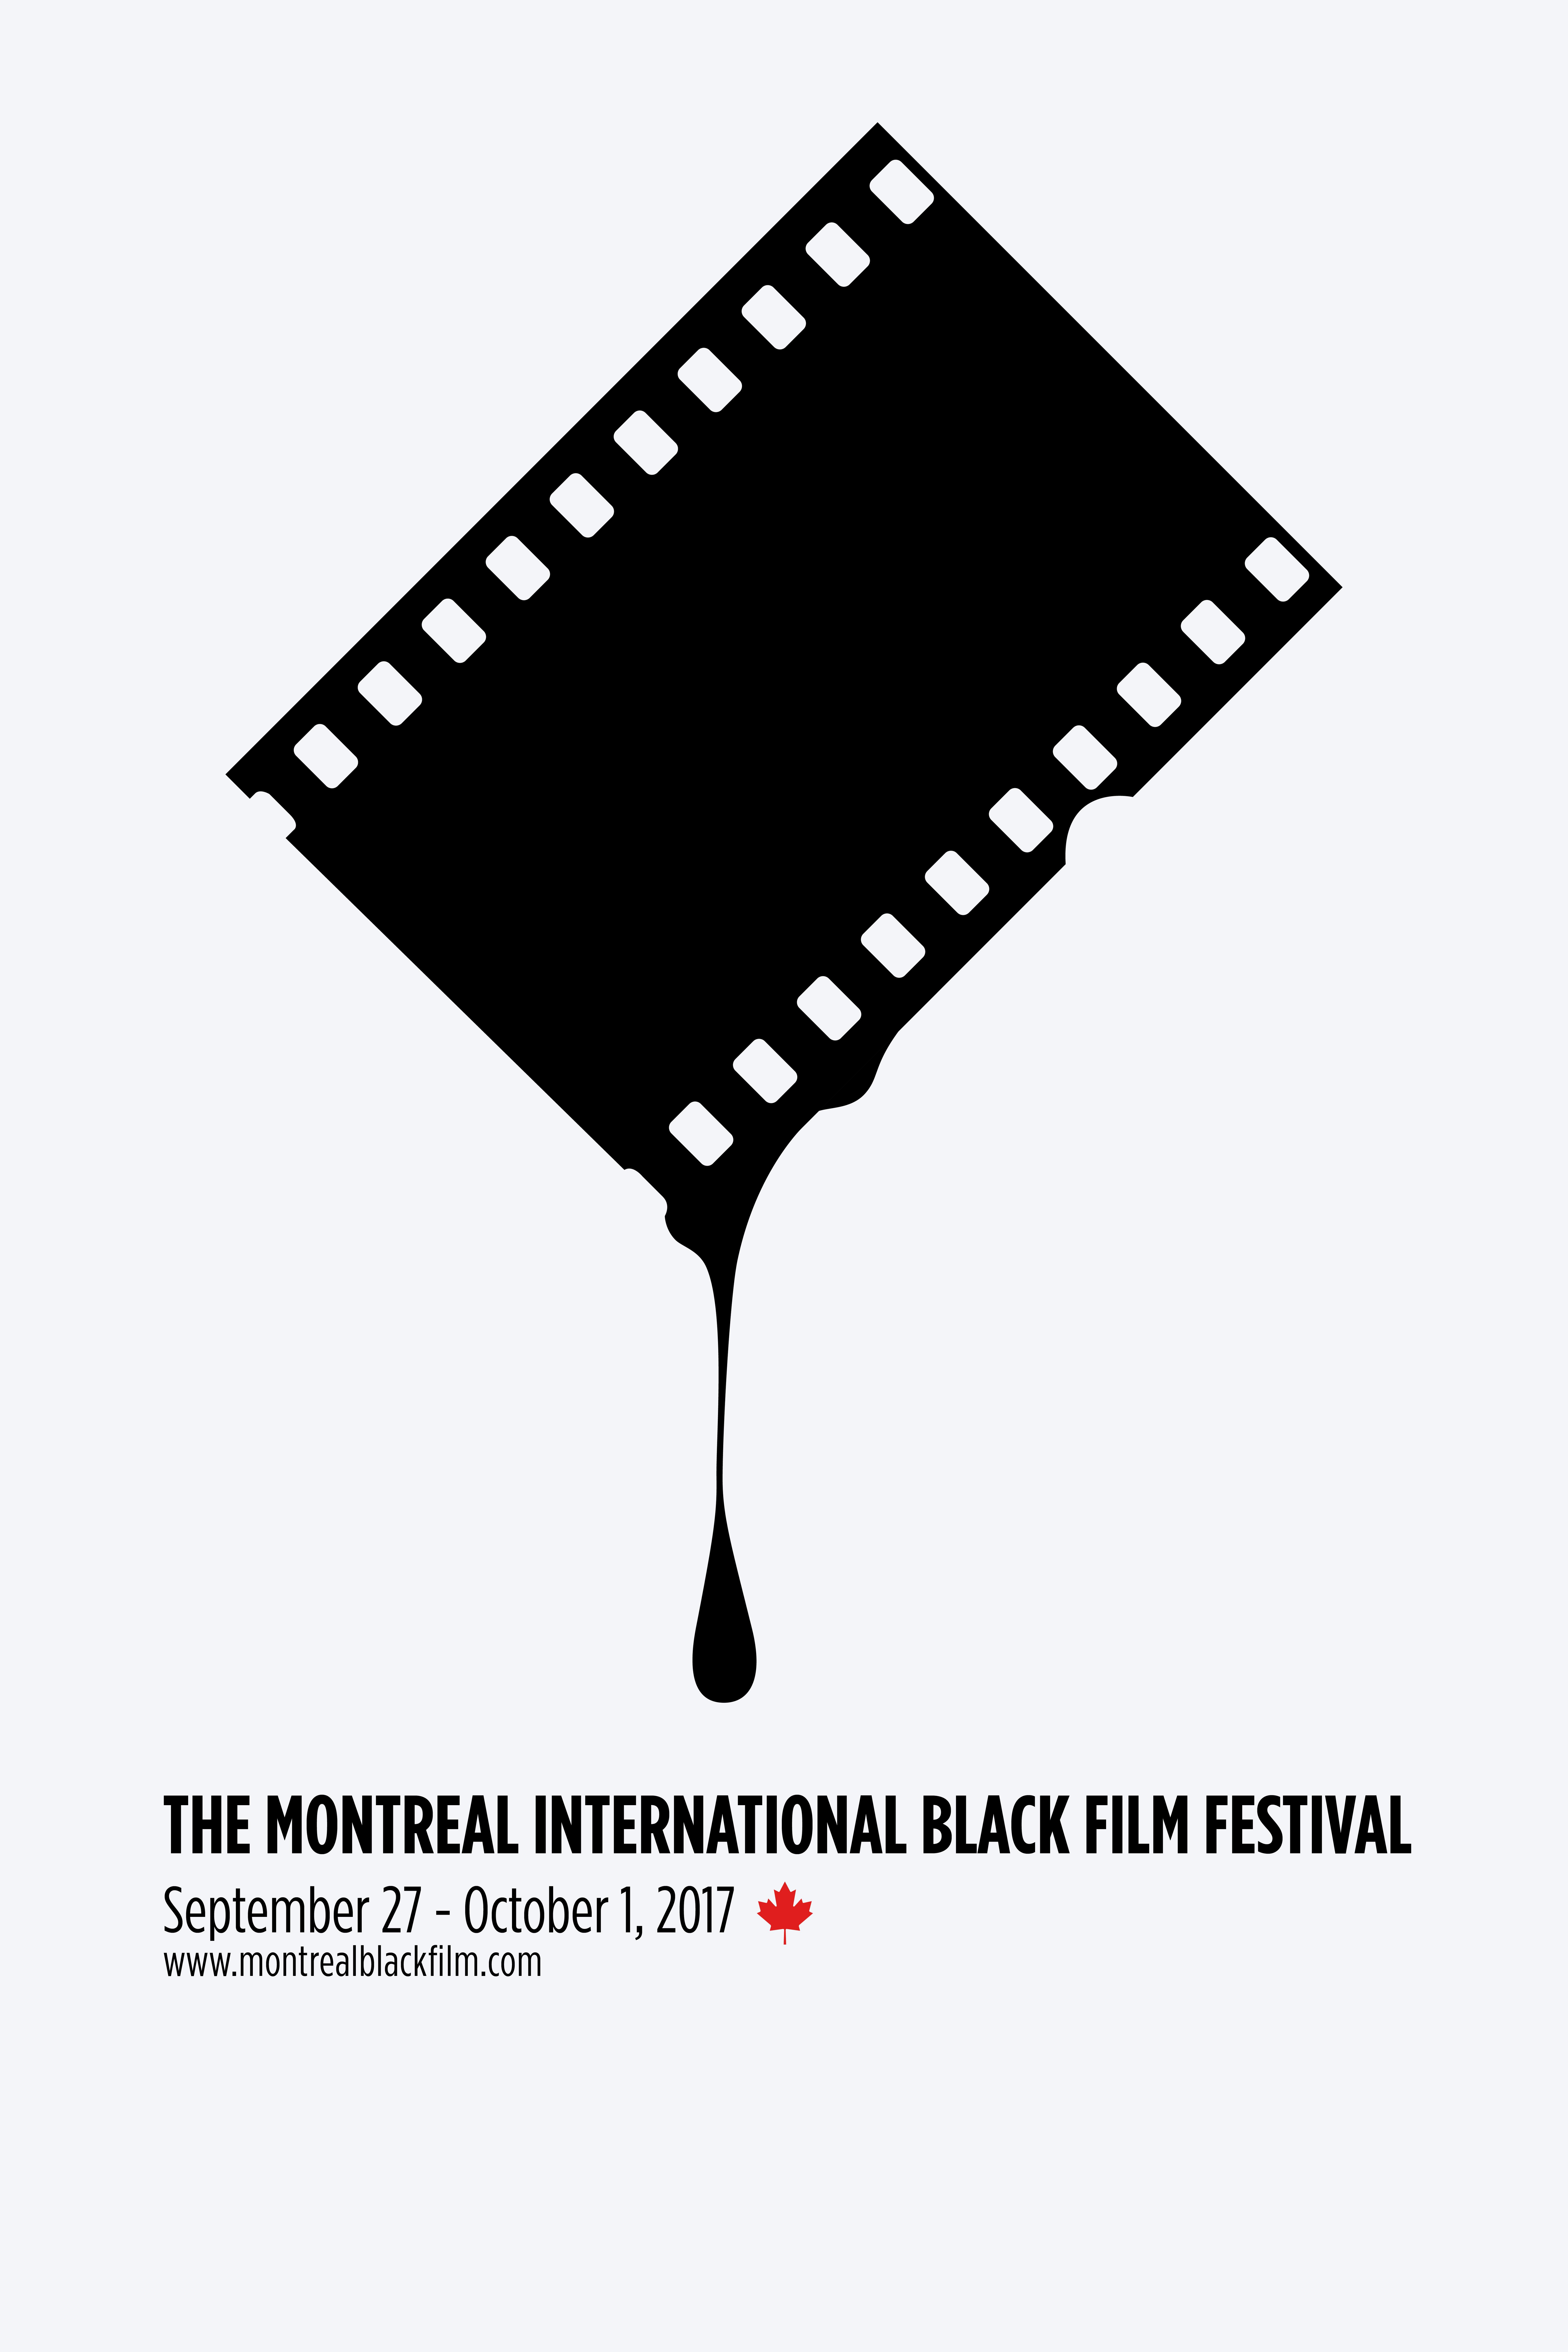 BlackfilmFestival ( Roozbeh Jafarzadeh)02